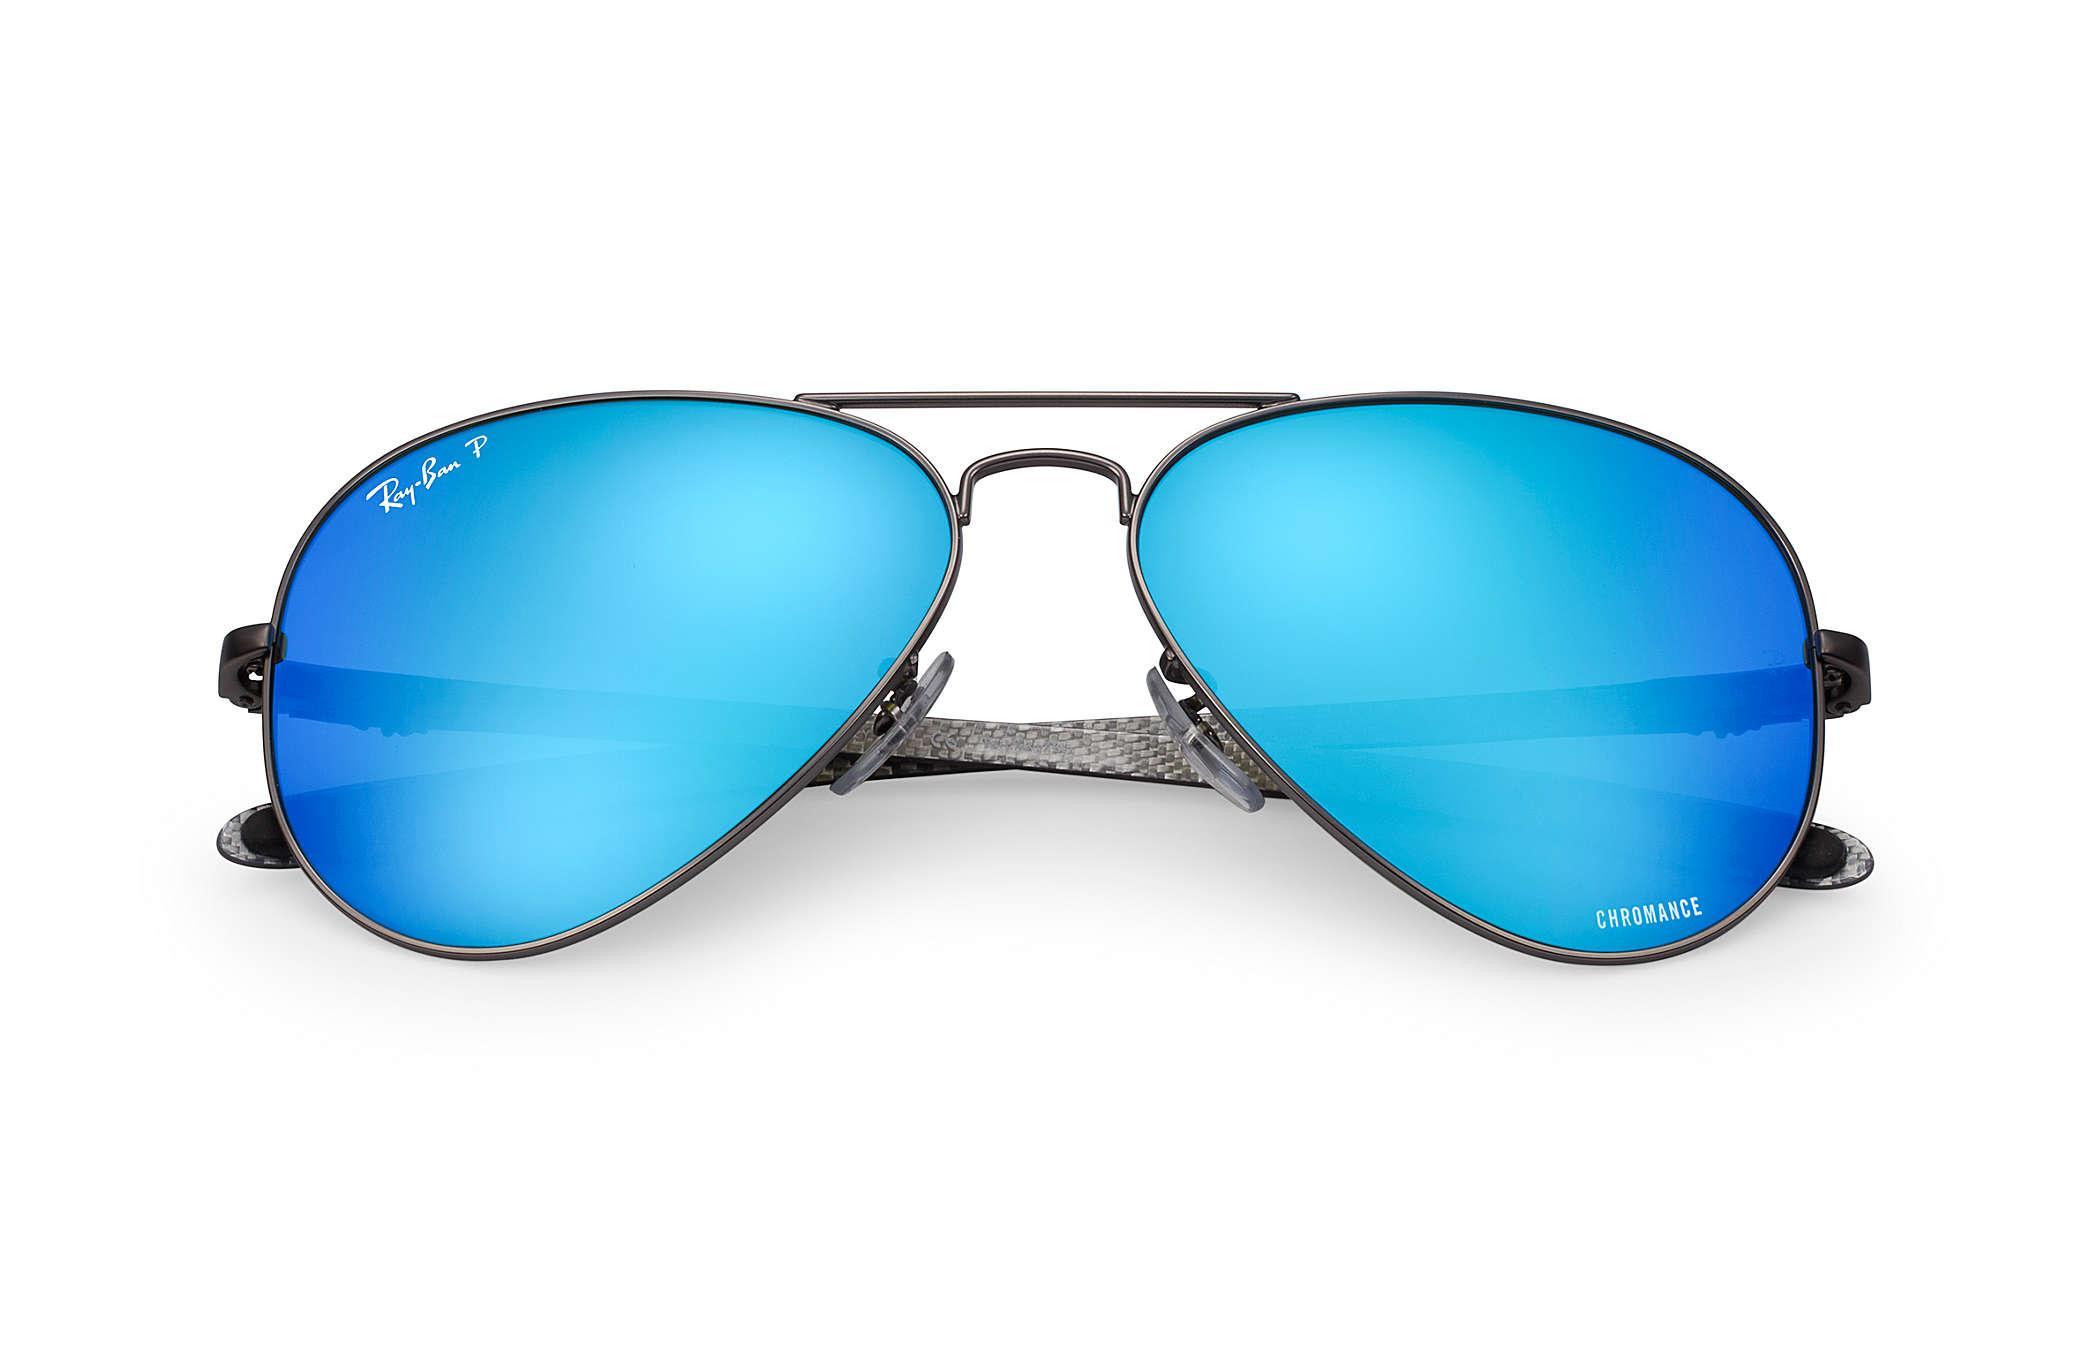 037a07a921 Ray-Ban - Blue Rb8317 Chromance Gunmetal - Lyst. View fullscreen